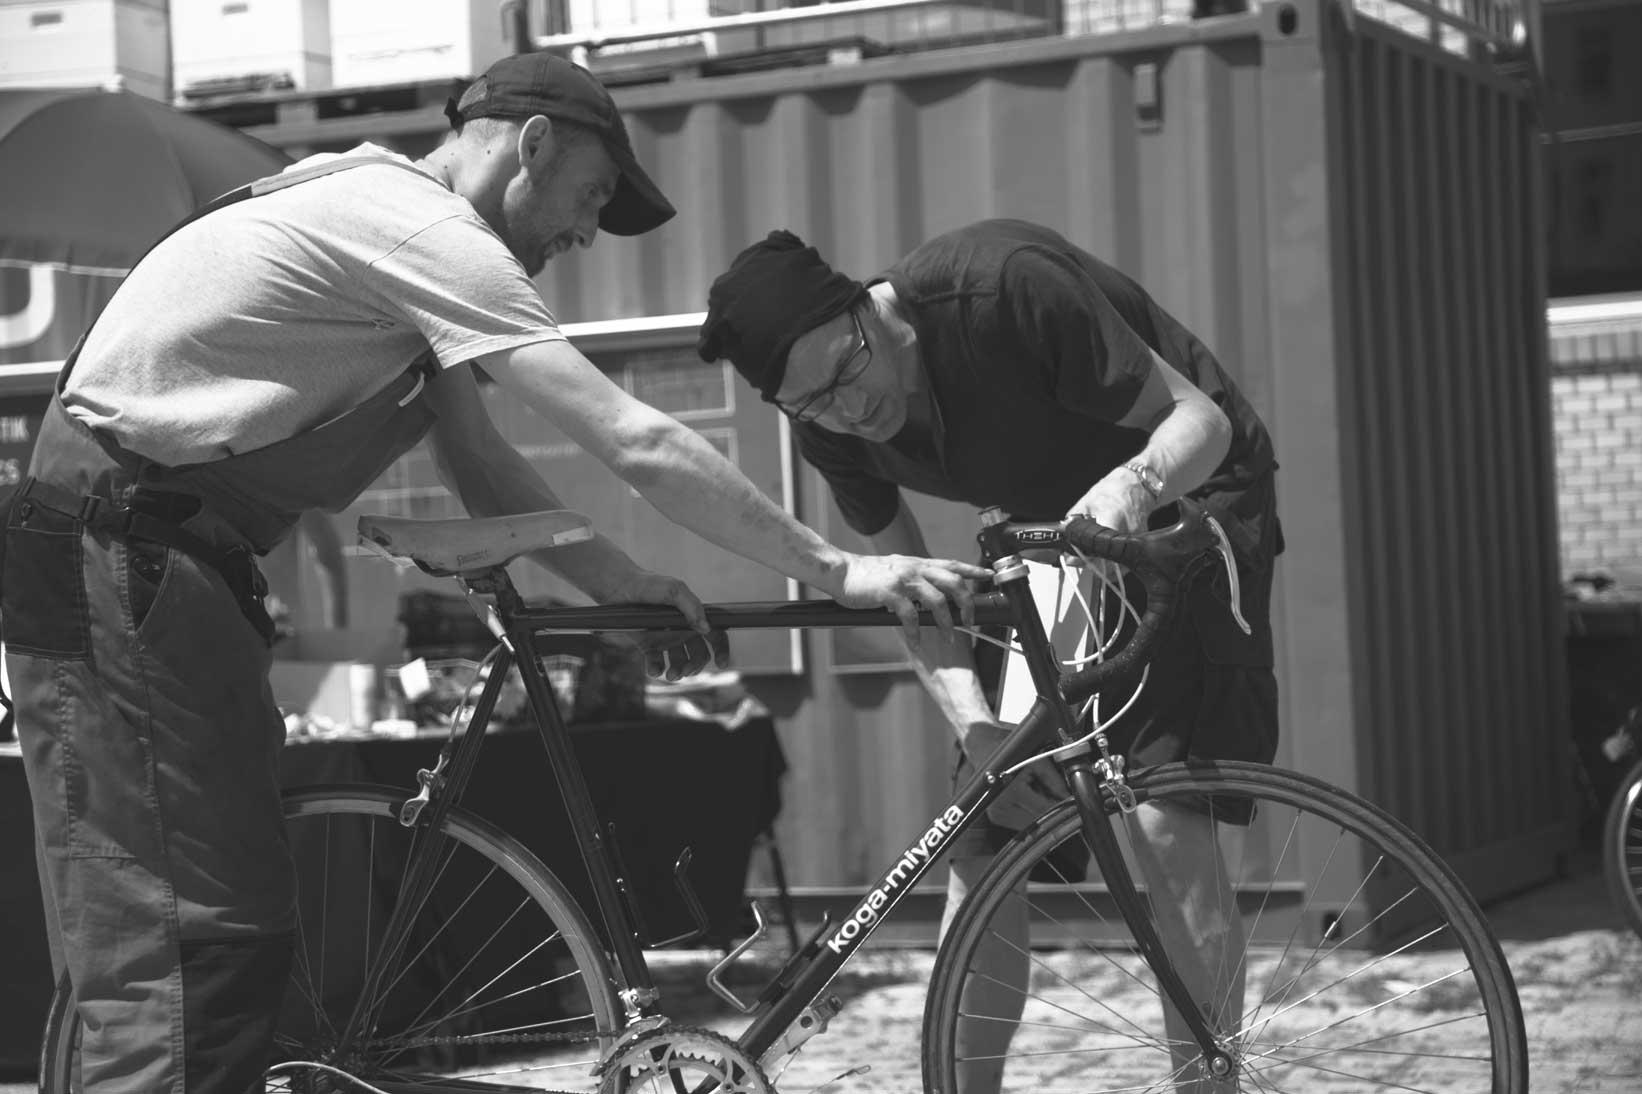 Fahrradmärkte Berlin in der Übersicht